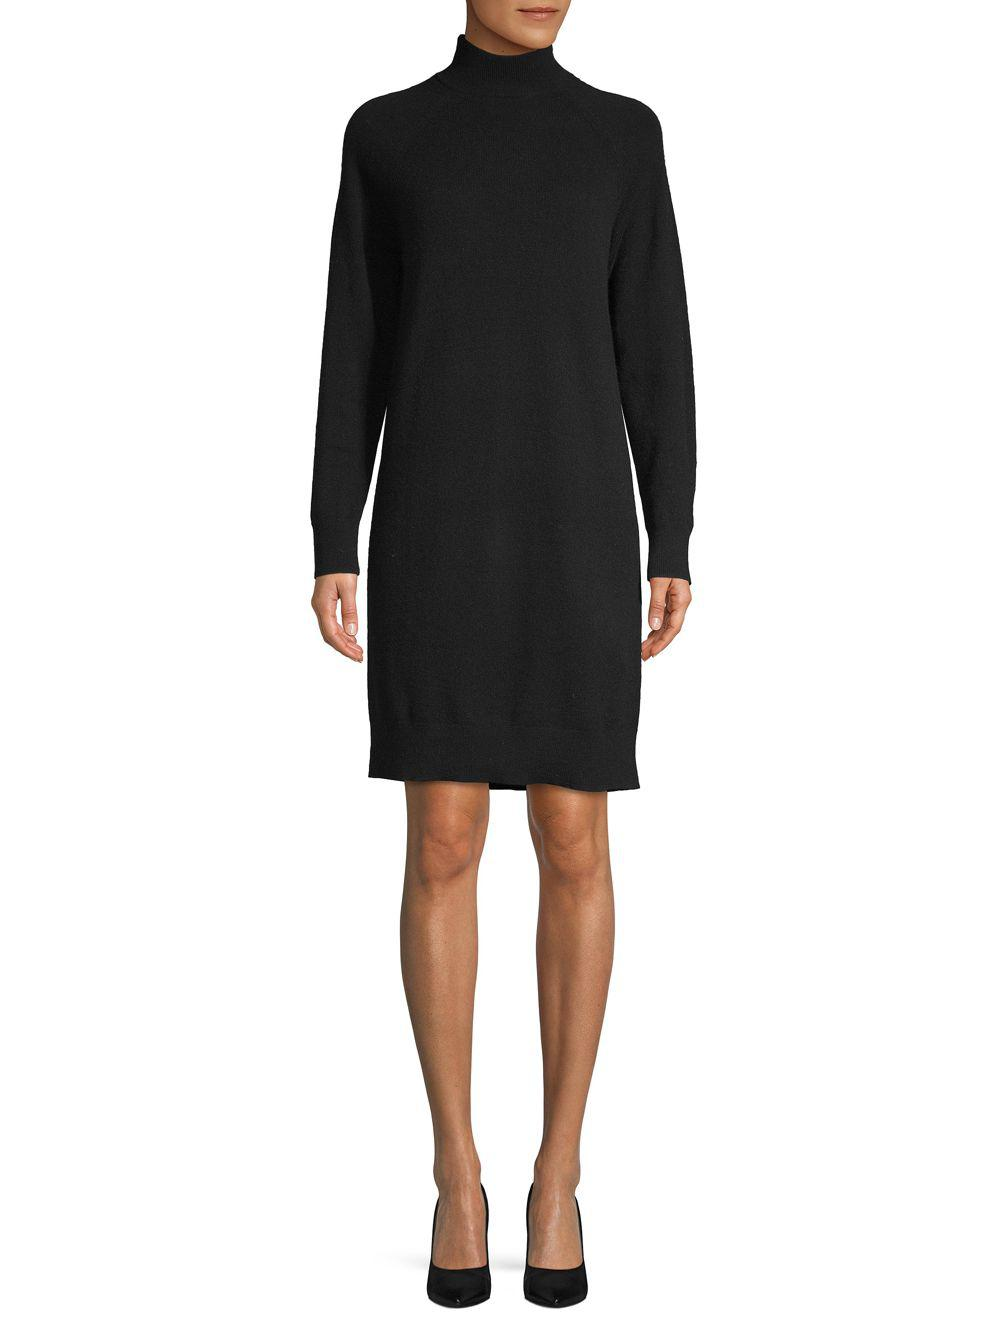 Saks Fifth Avenue Cashmere Sweater Dress